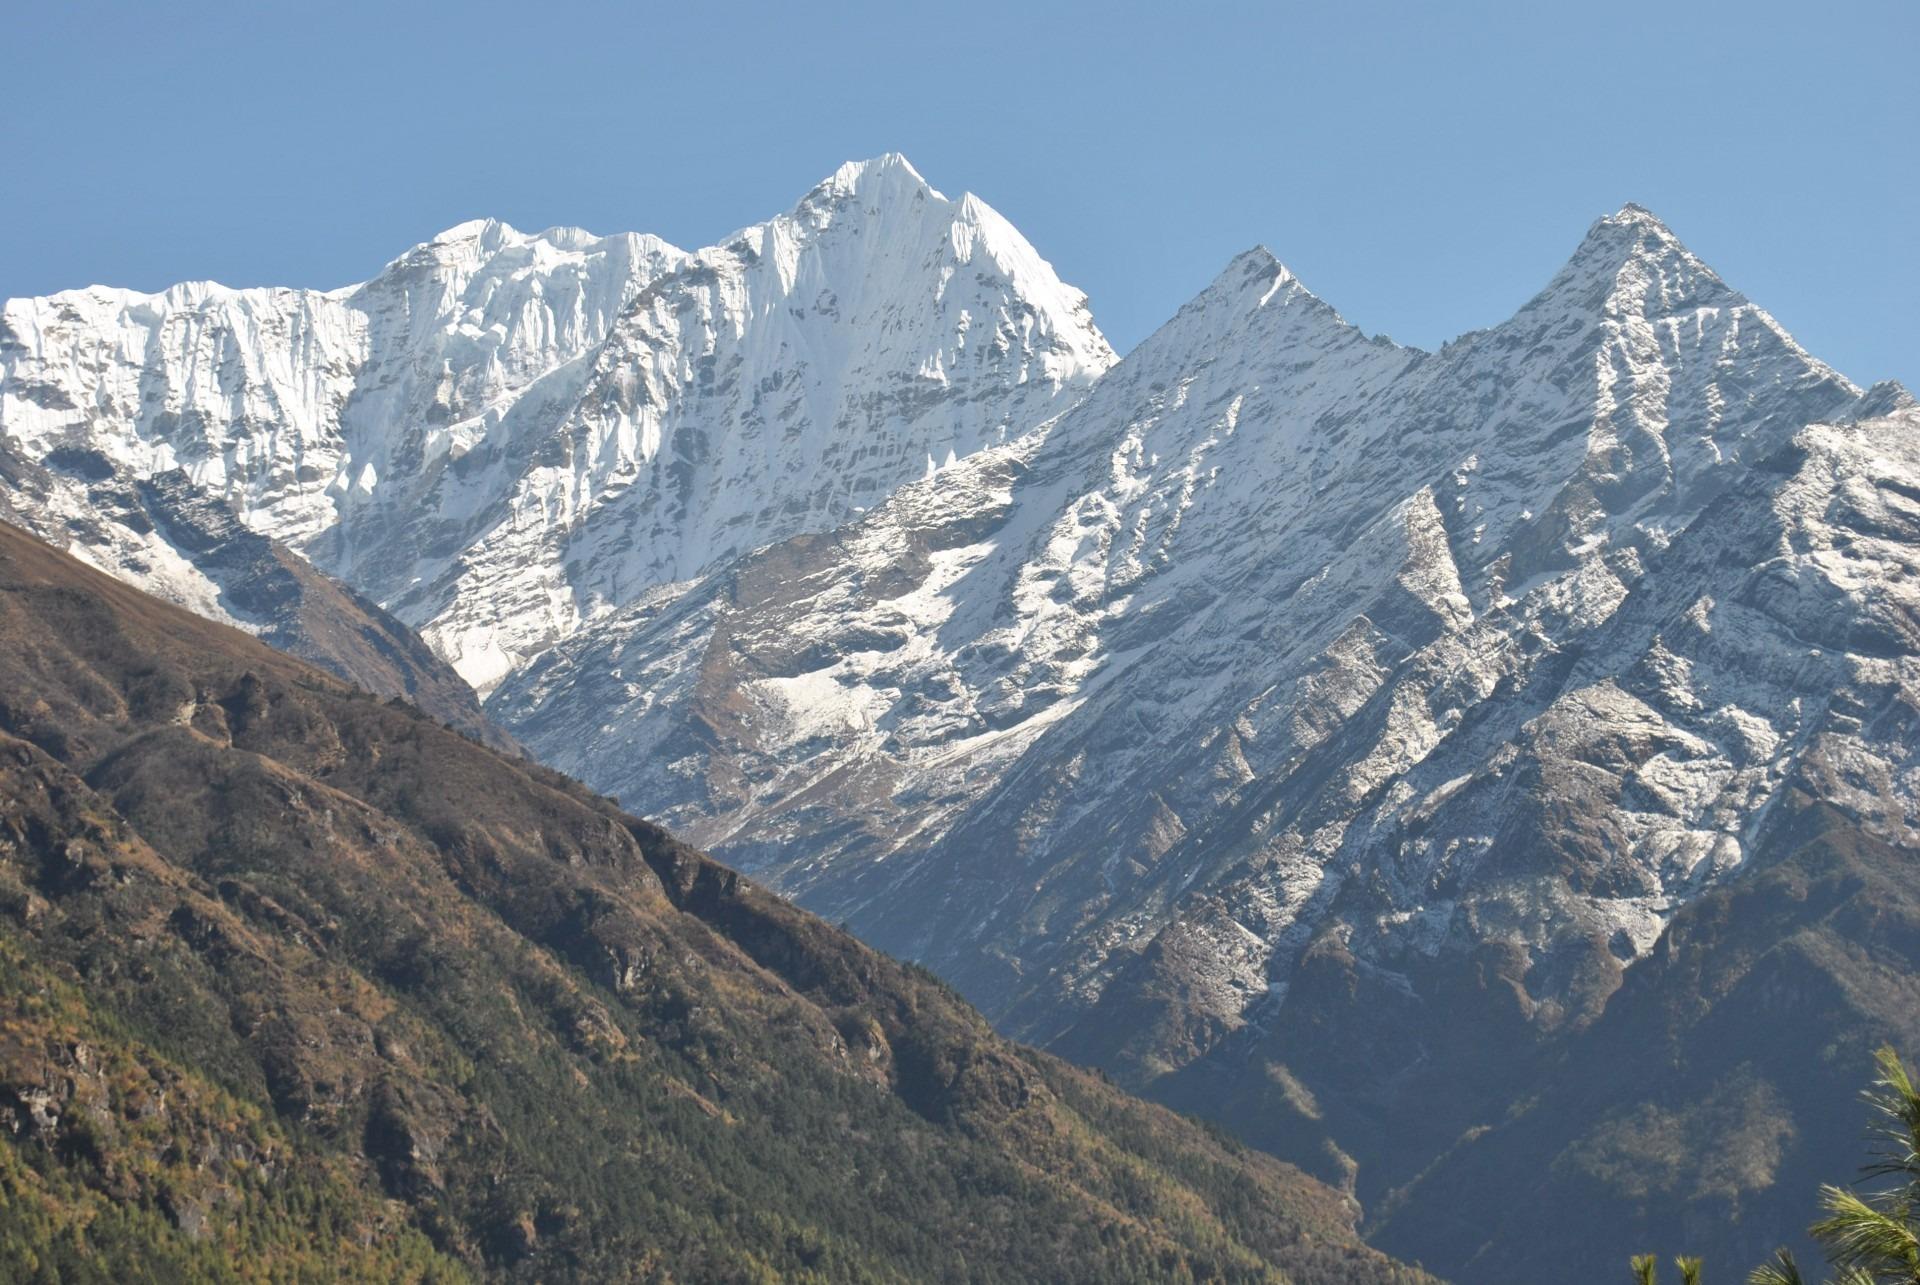 Gambar Pemandangan Outdoor Gurun Salju Petualangan Lembah